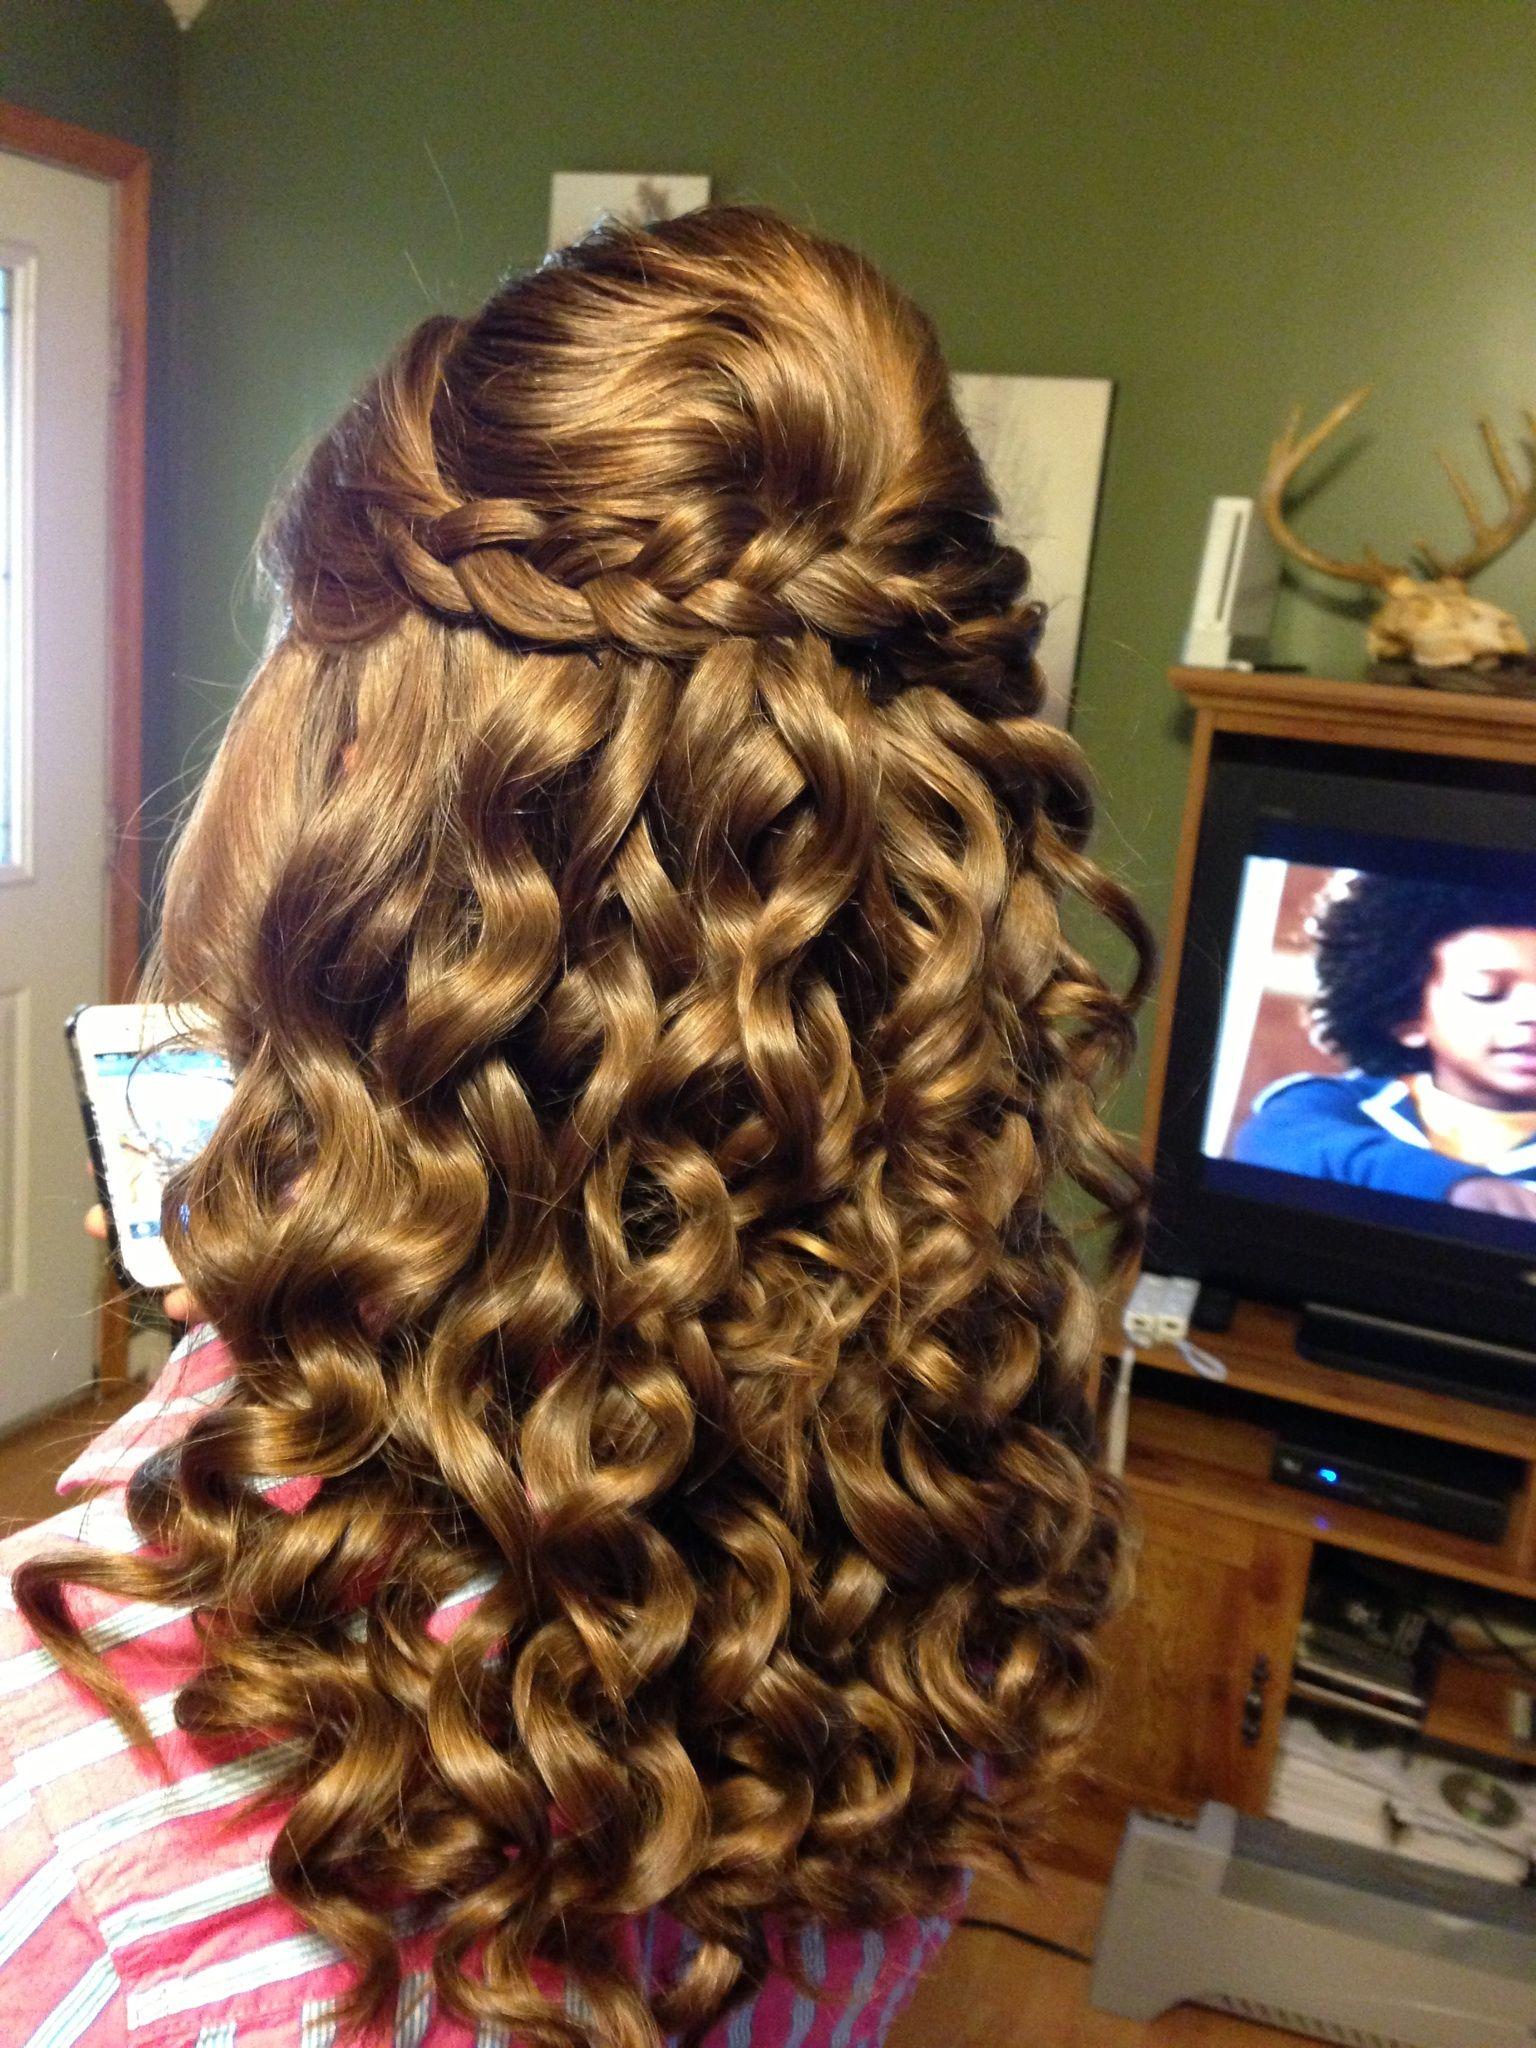 23 prom hairstyles ideas for long hair | hair ideas | curly